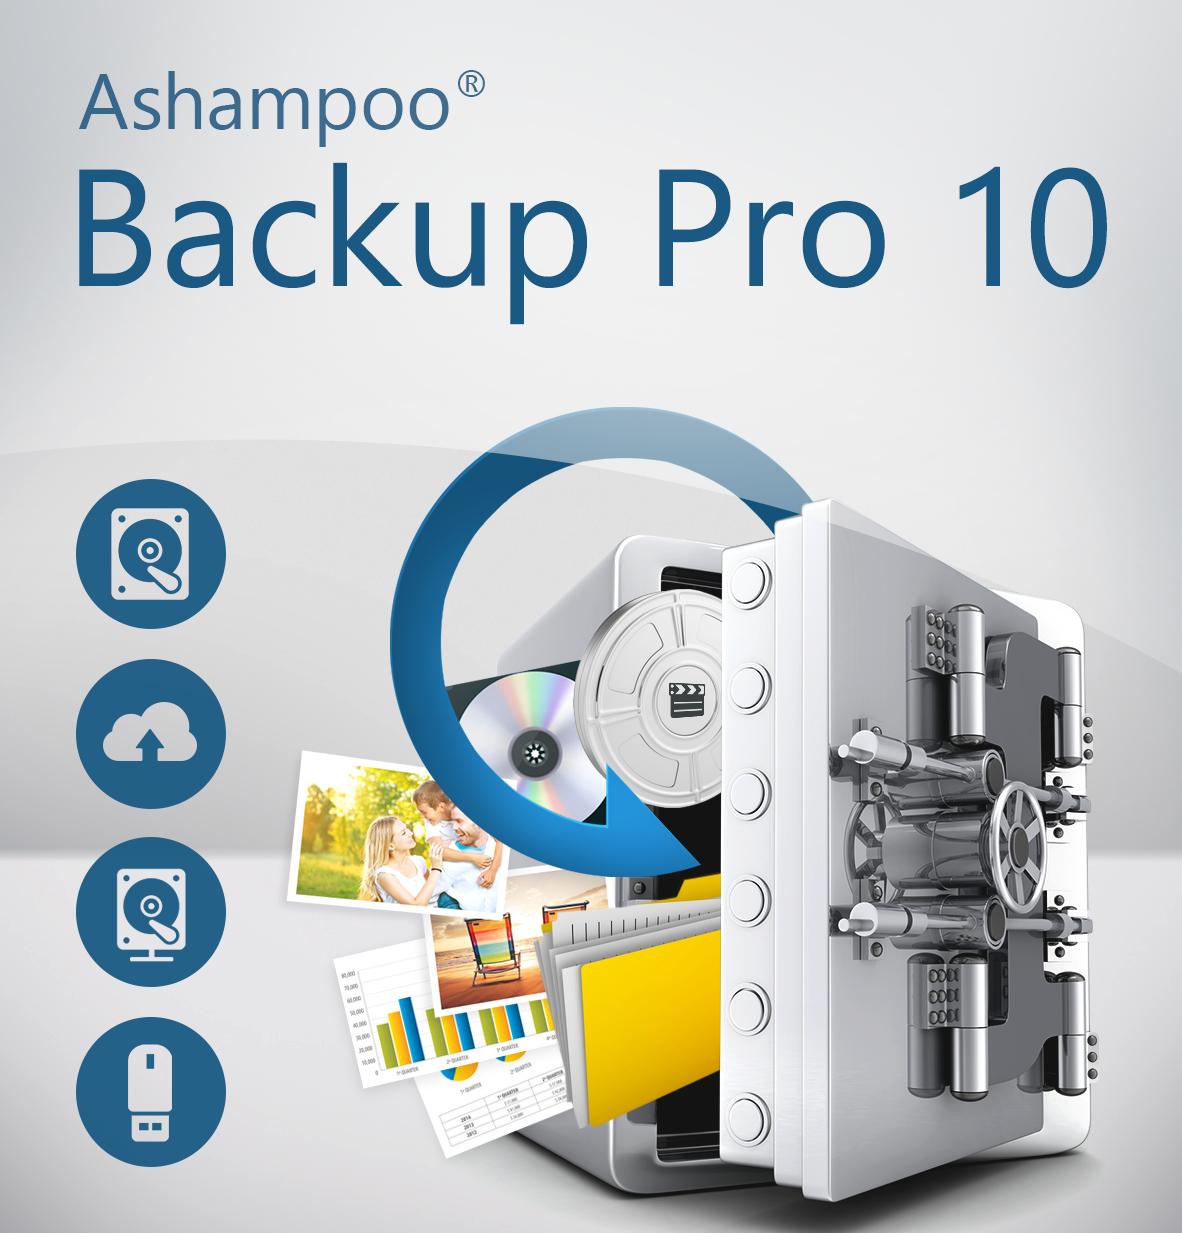 Ashampoo Backup Pro 10 (PC) HTC Vive Support Oculus Rift